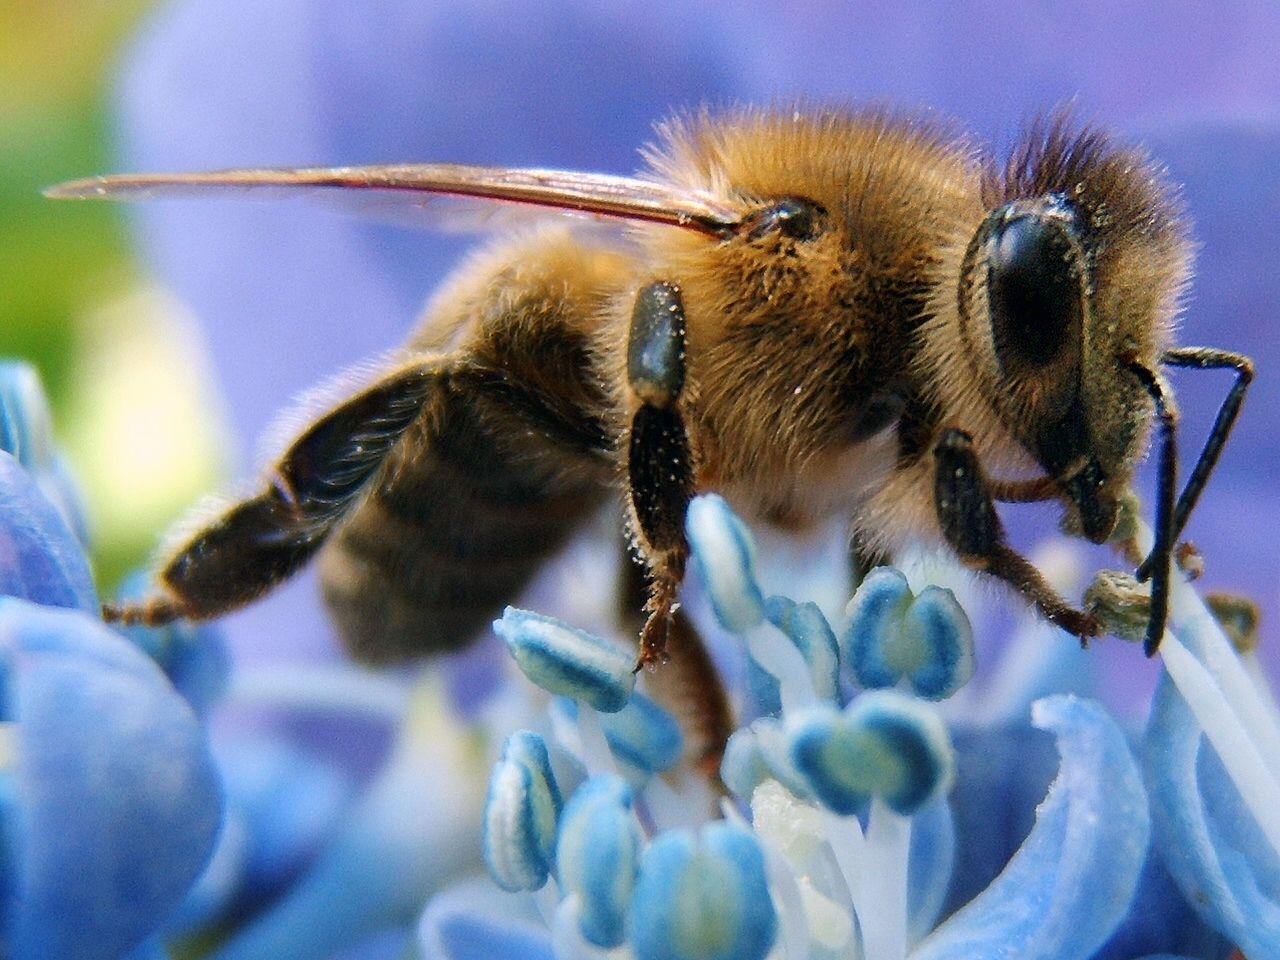 Western honey bee on flower